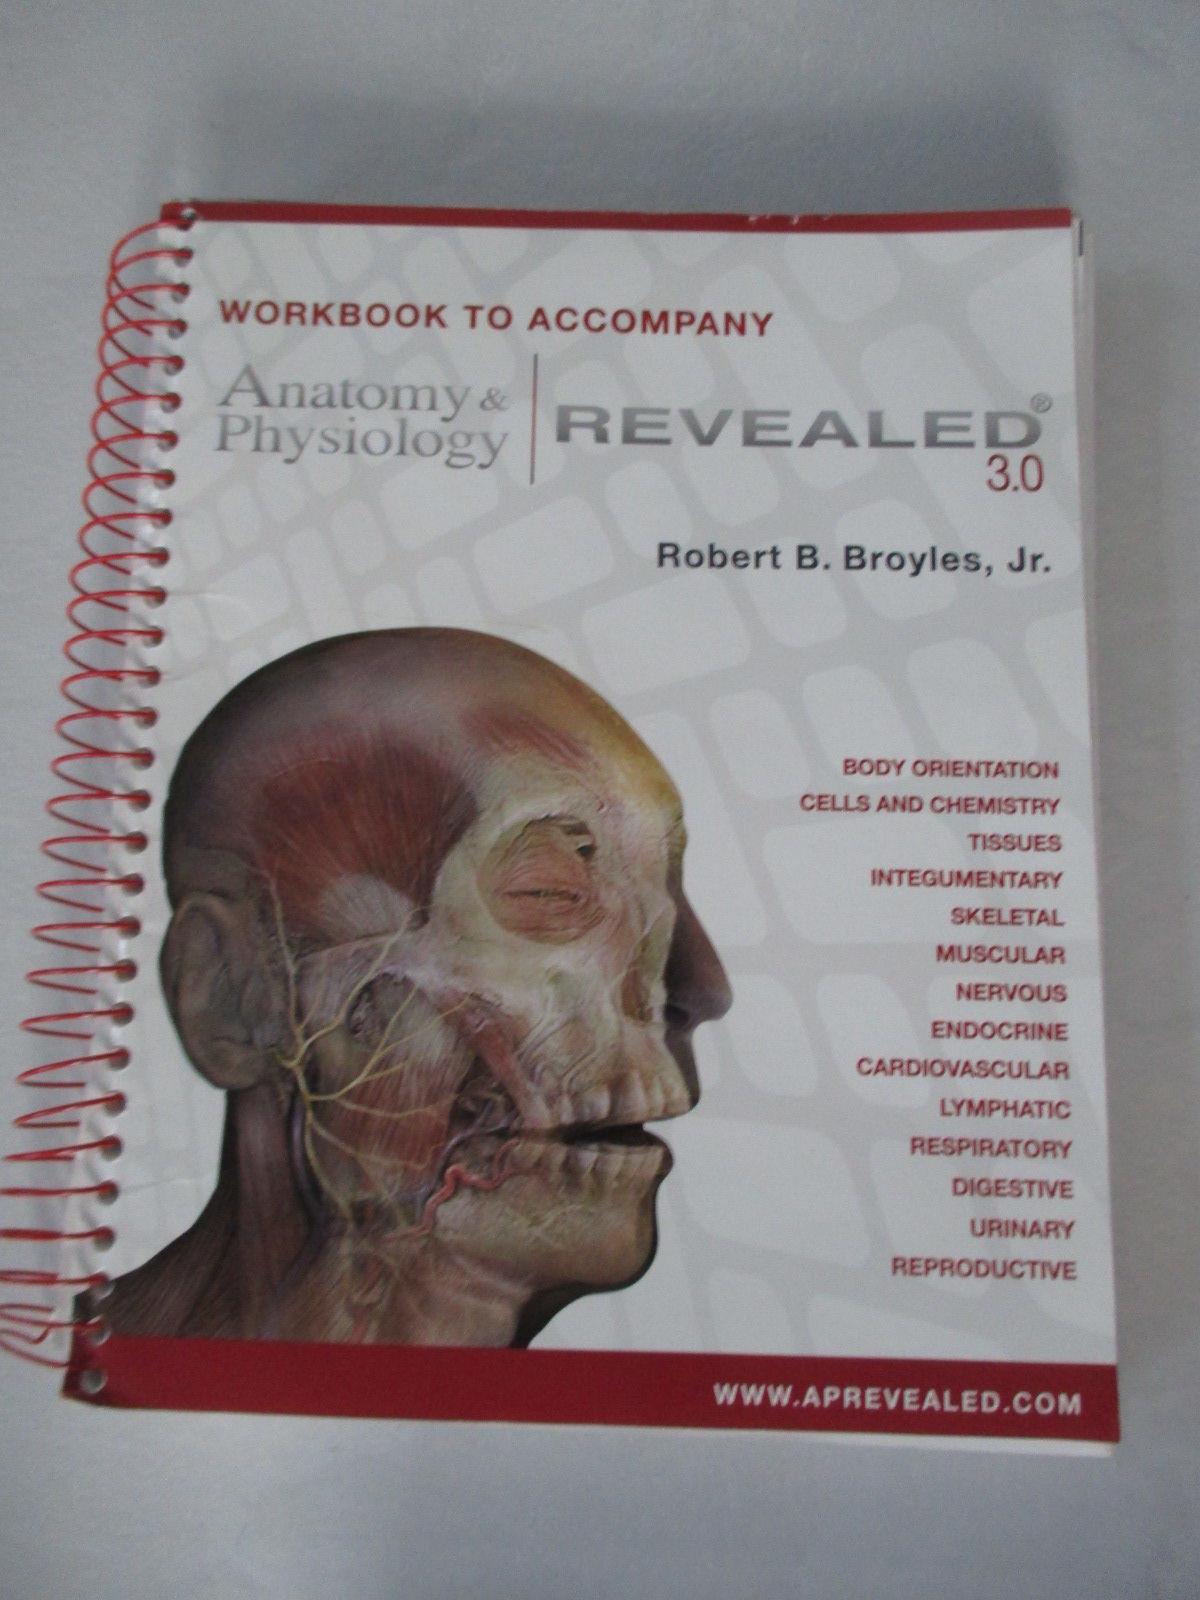 9780073403670 - Workbook to accompany Anatomy & Physiology Revealed ...